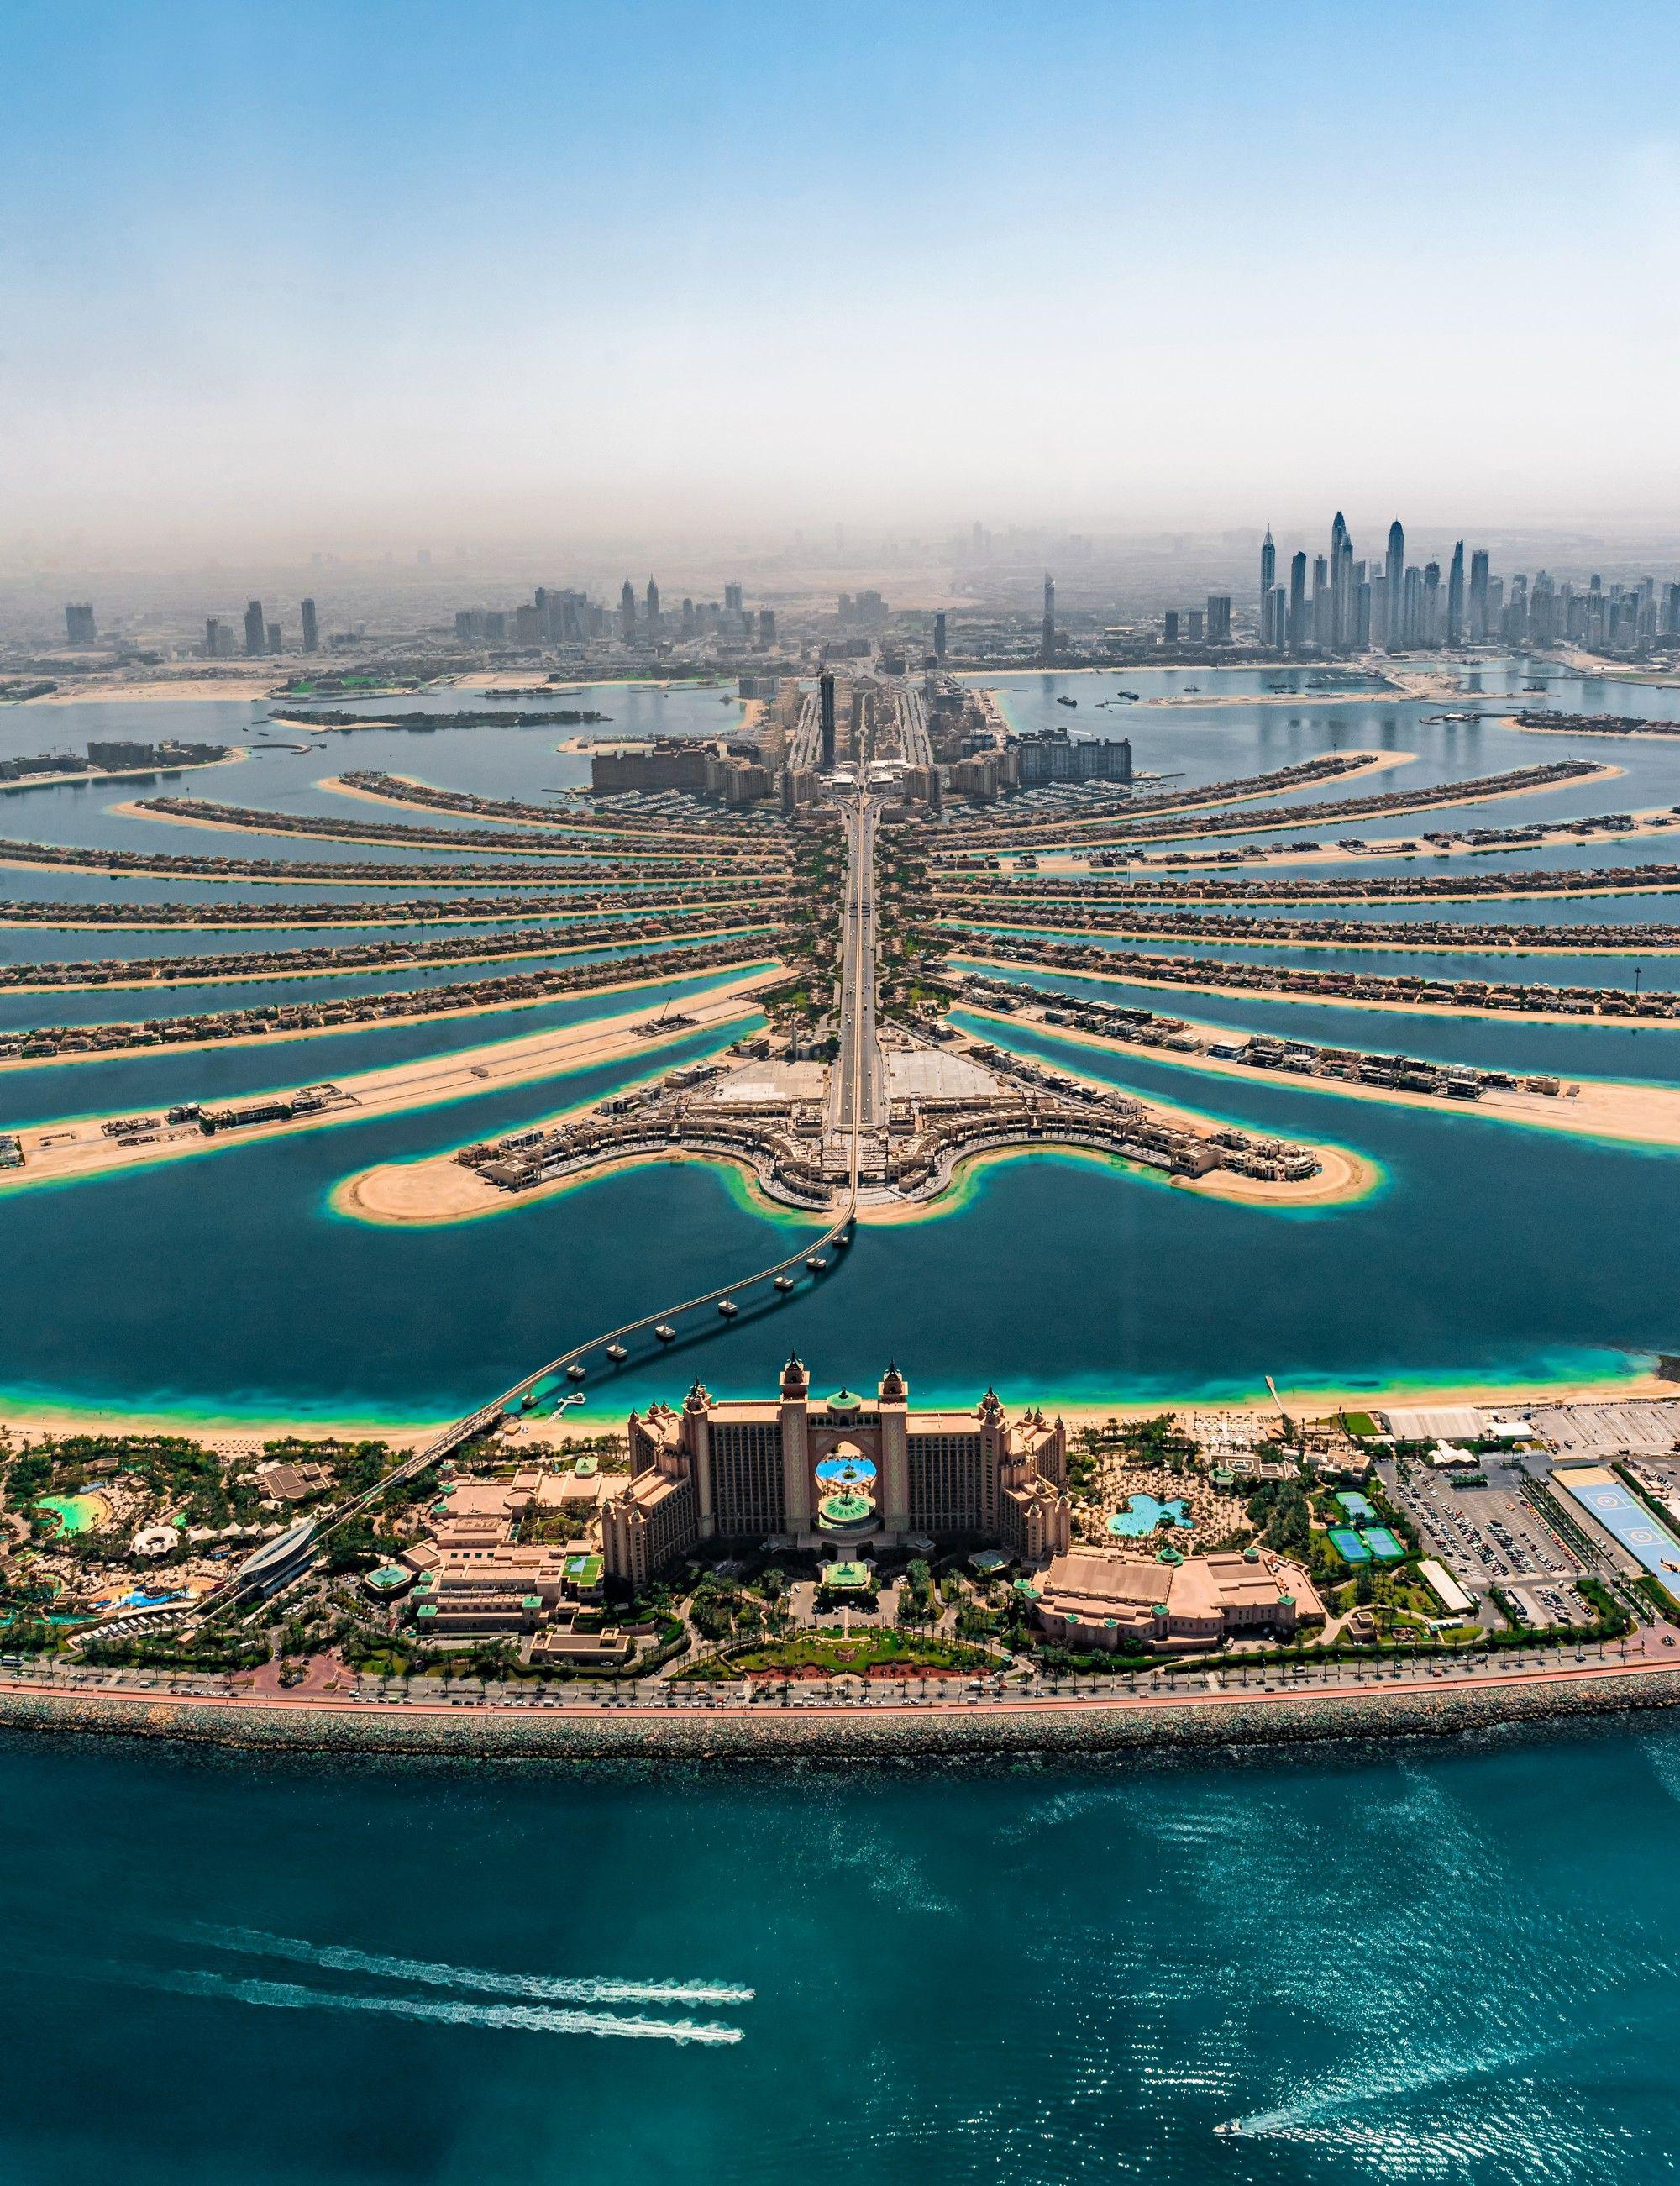 Apoteoza invenției umane este Palm Jumeirah din Dubai: o